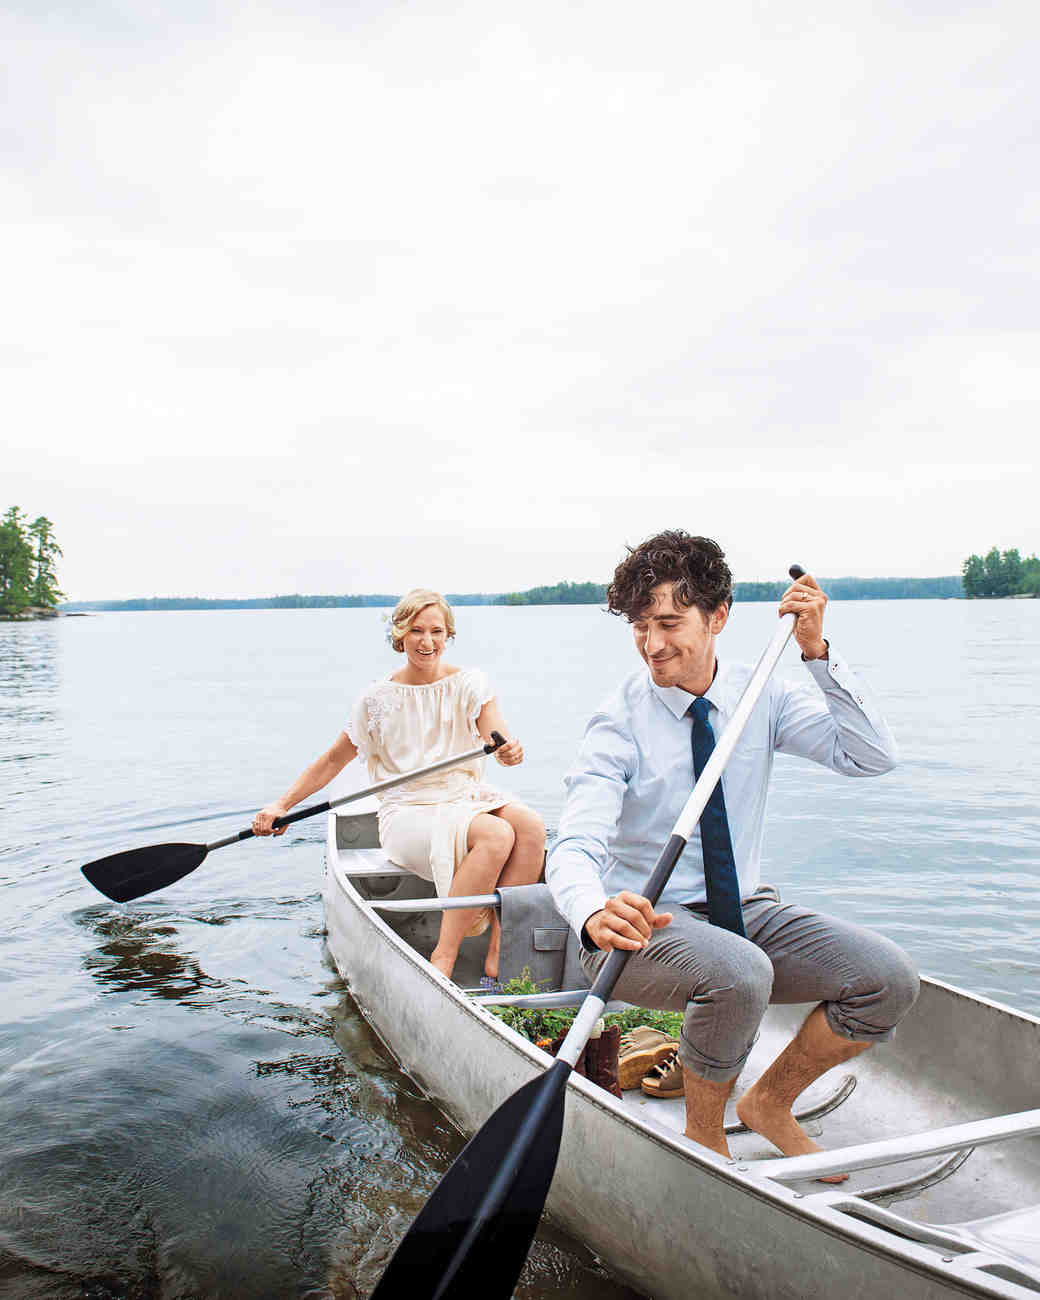 teresa-pepin-tp-505-canoe-s111105.jpg